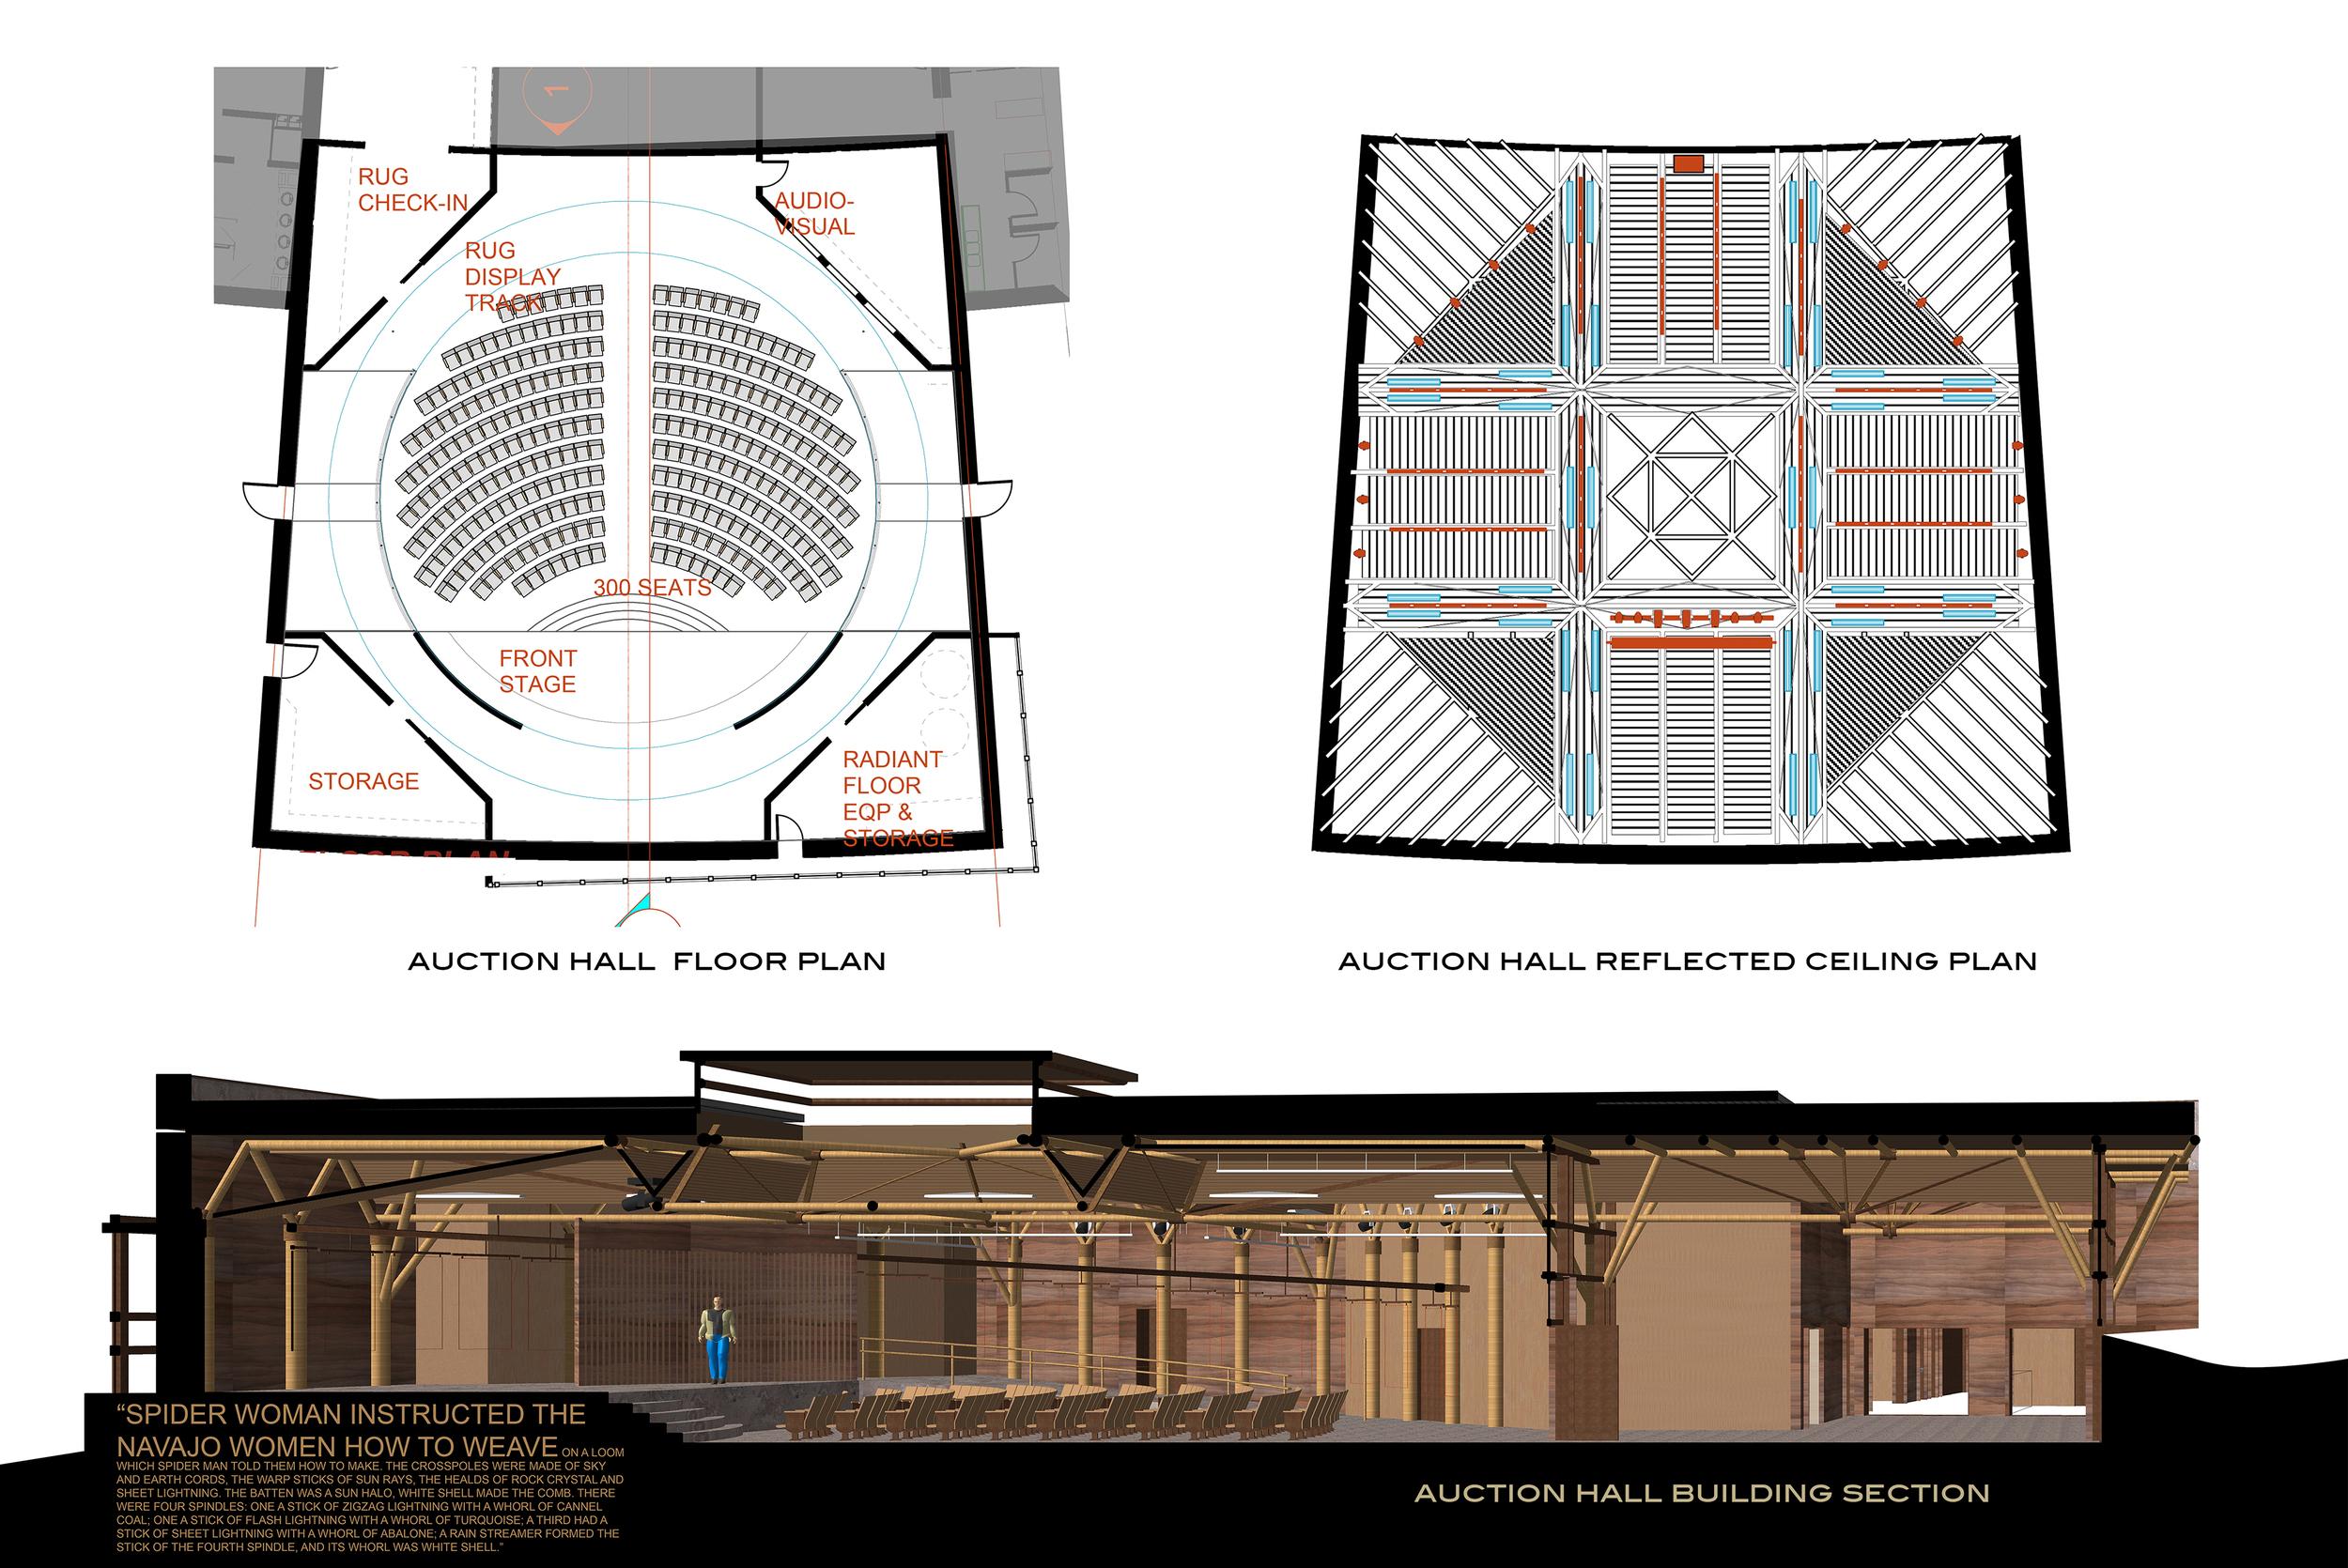 RA_AUCTION FLoor Plan.jpg